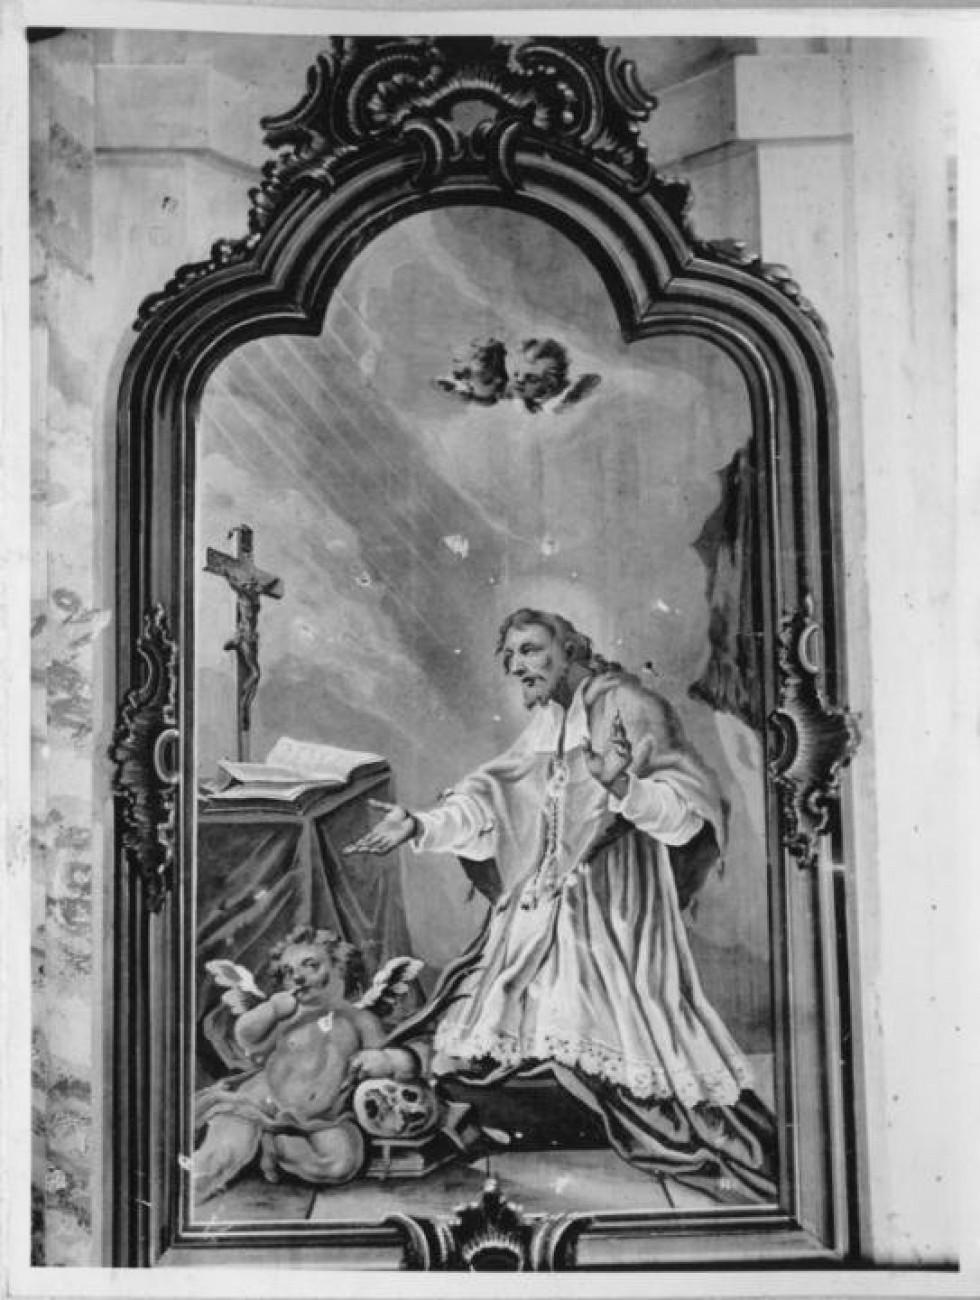 Фреска Ян Непомуцький біля вівтаря (1762-1765)